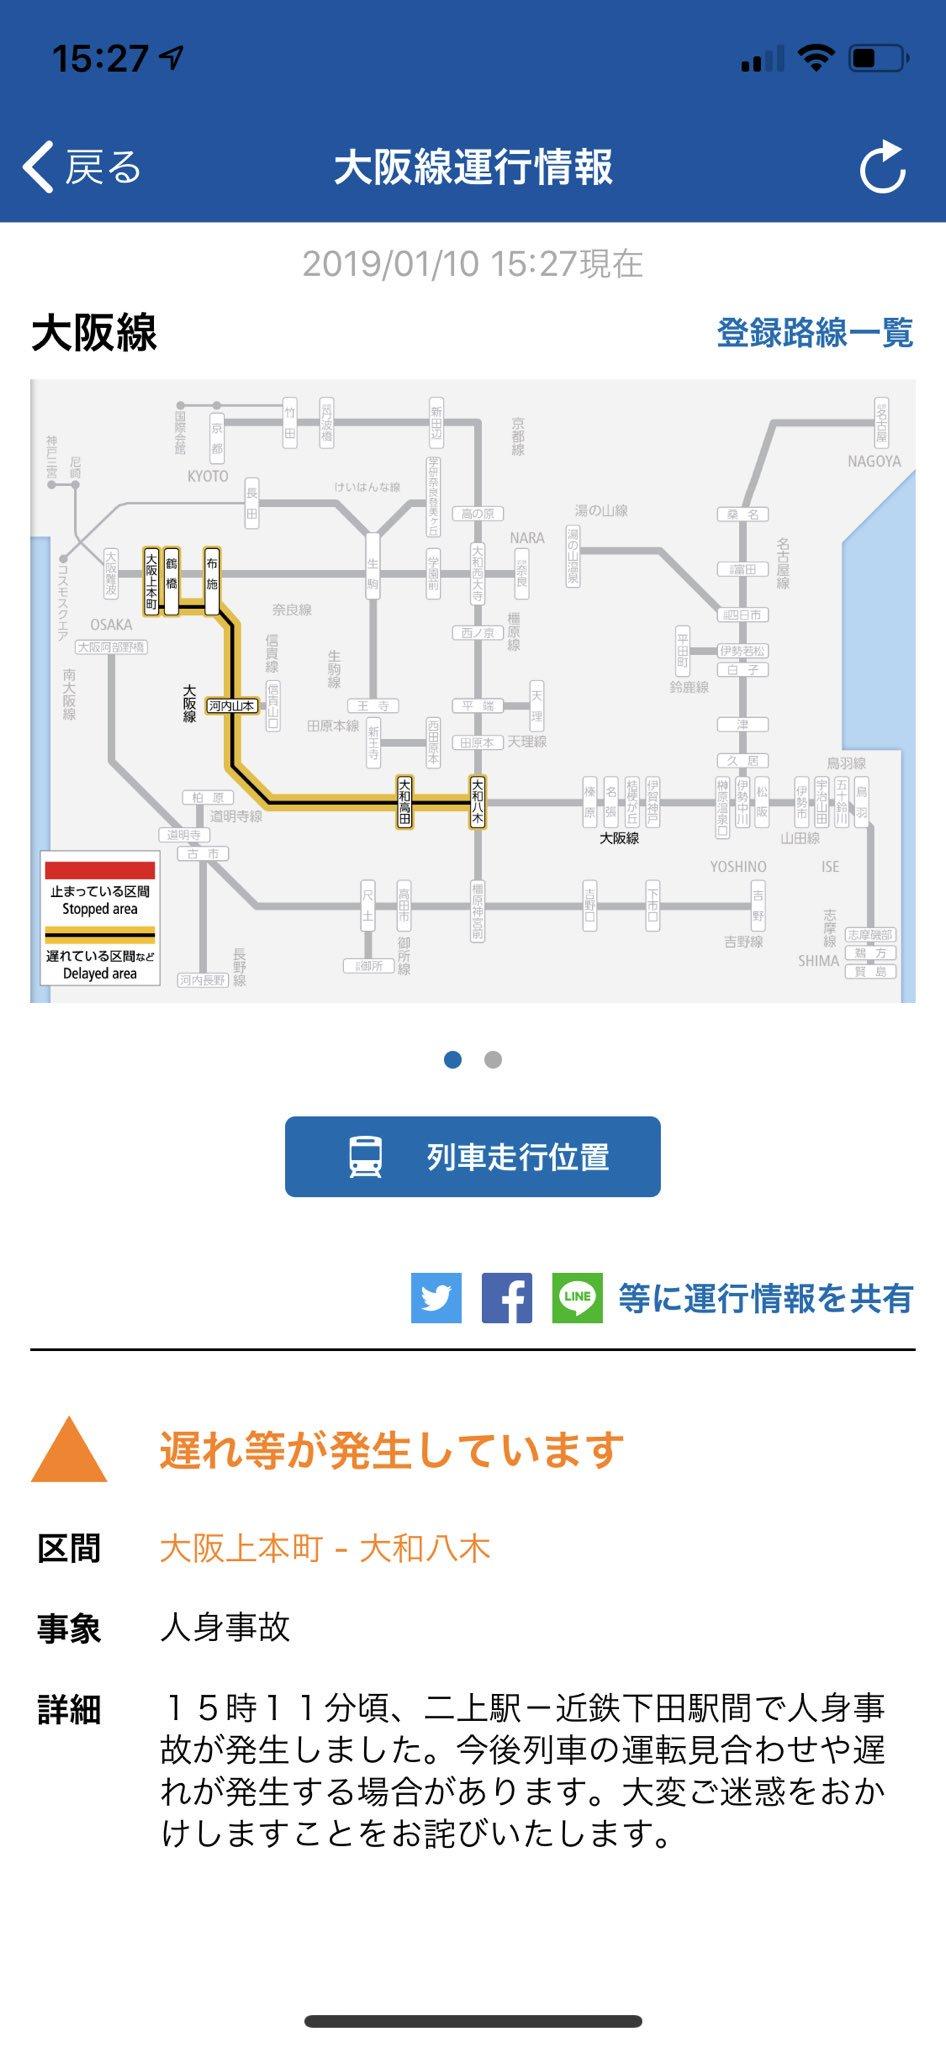 画像,近鉄大阪線 伊勢志摩ライナー7304列車で人身事故発生の模様 https://t.co/XhlsClrlFX。